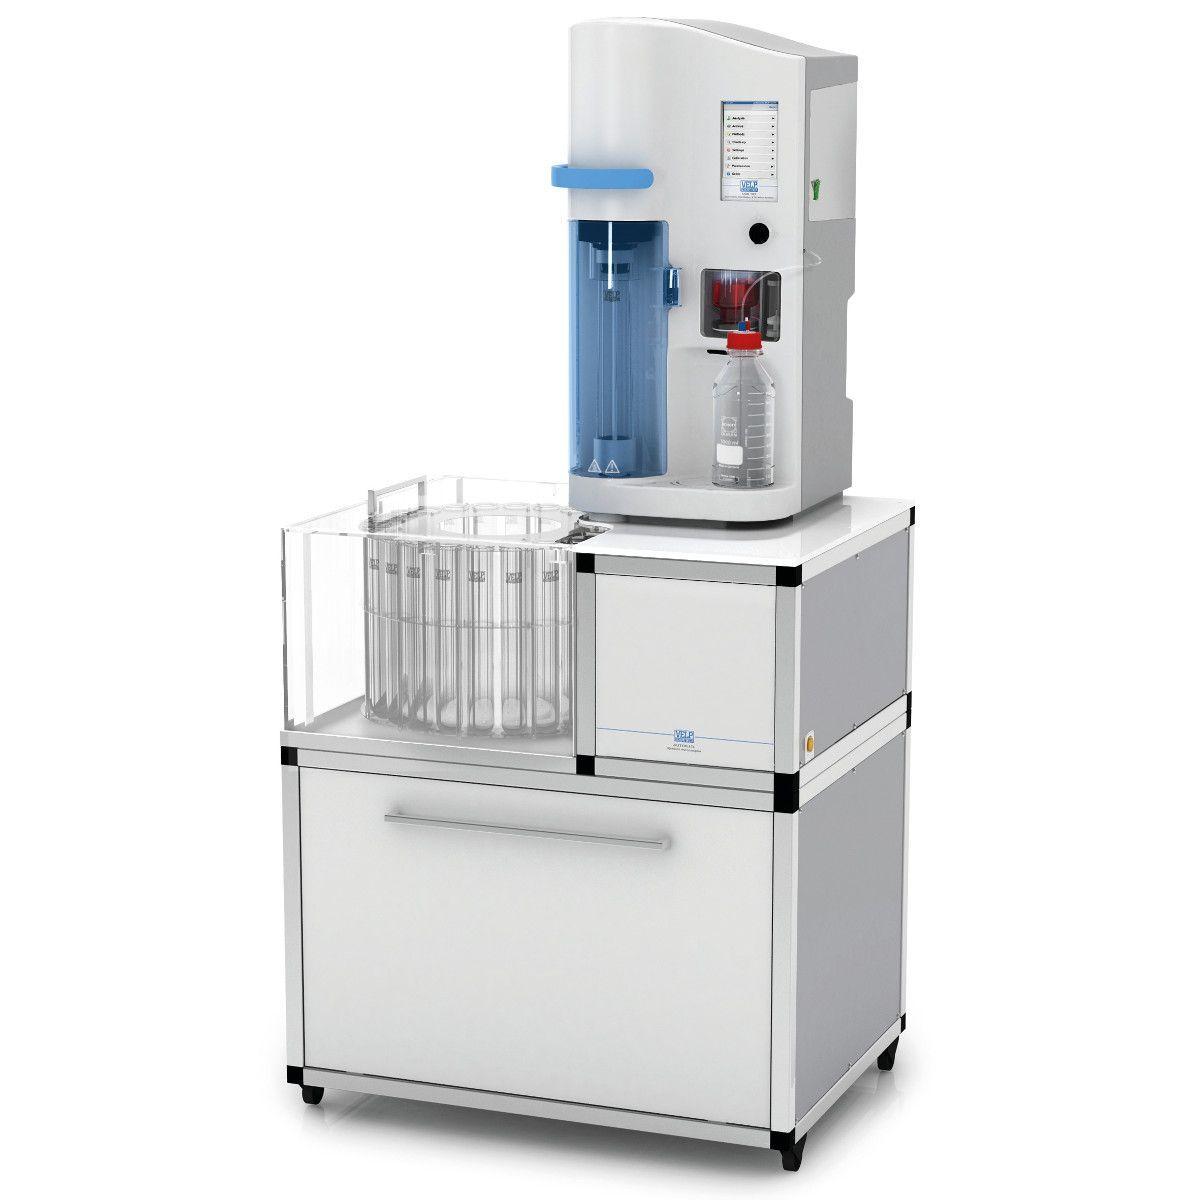 VELP Scientifica- UDK 169 Automatic Kjeldahl Analyzer with AutoKjel Autosampler